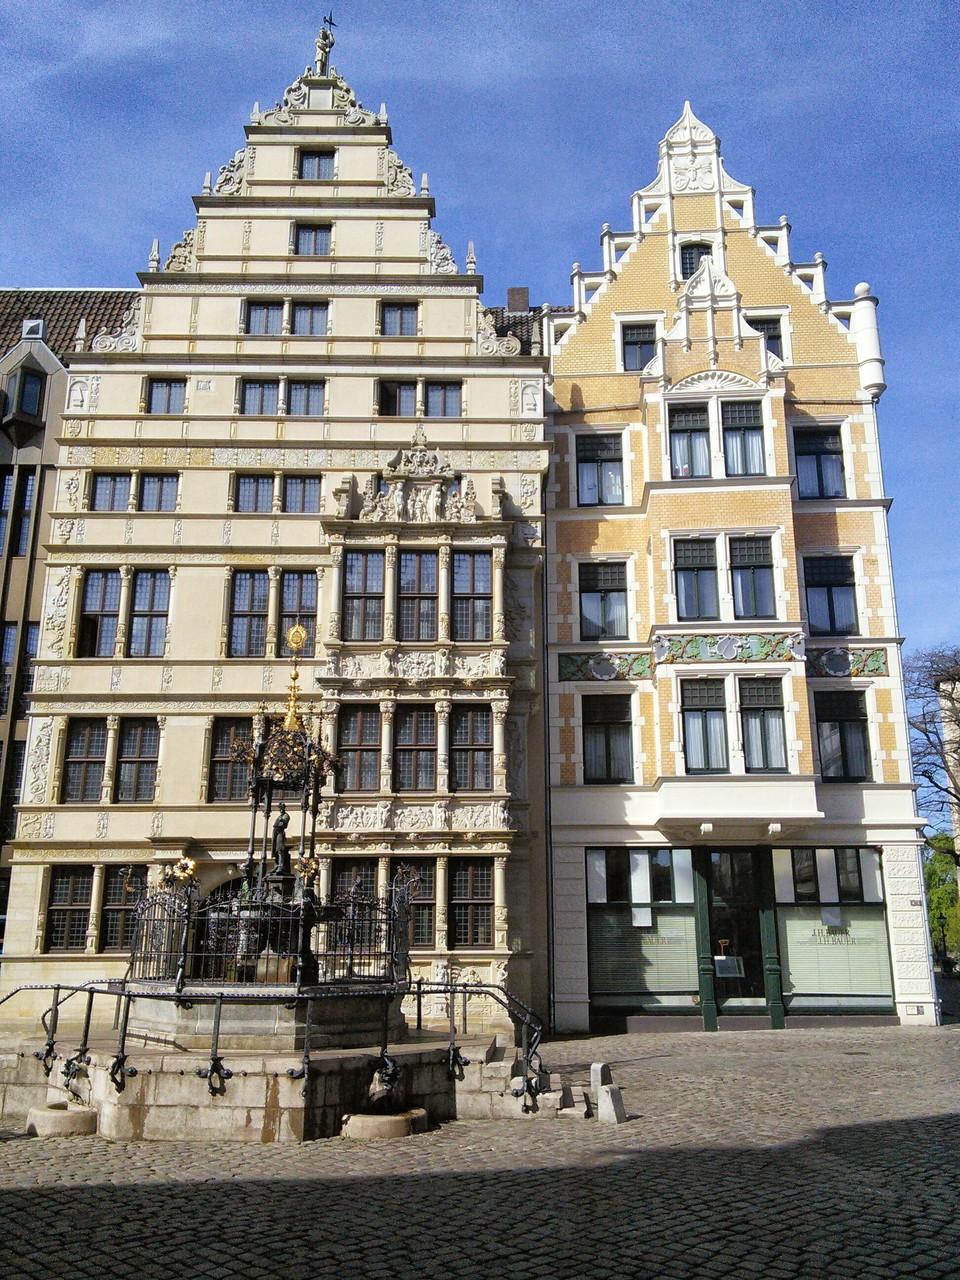 Holzmarktbrunnen vor dem Leibnitzhaus Hannover